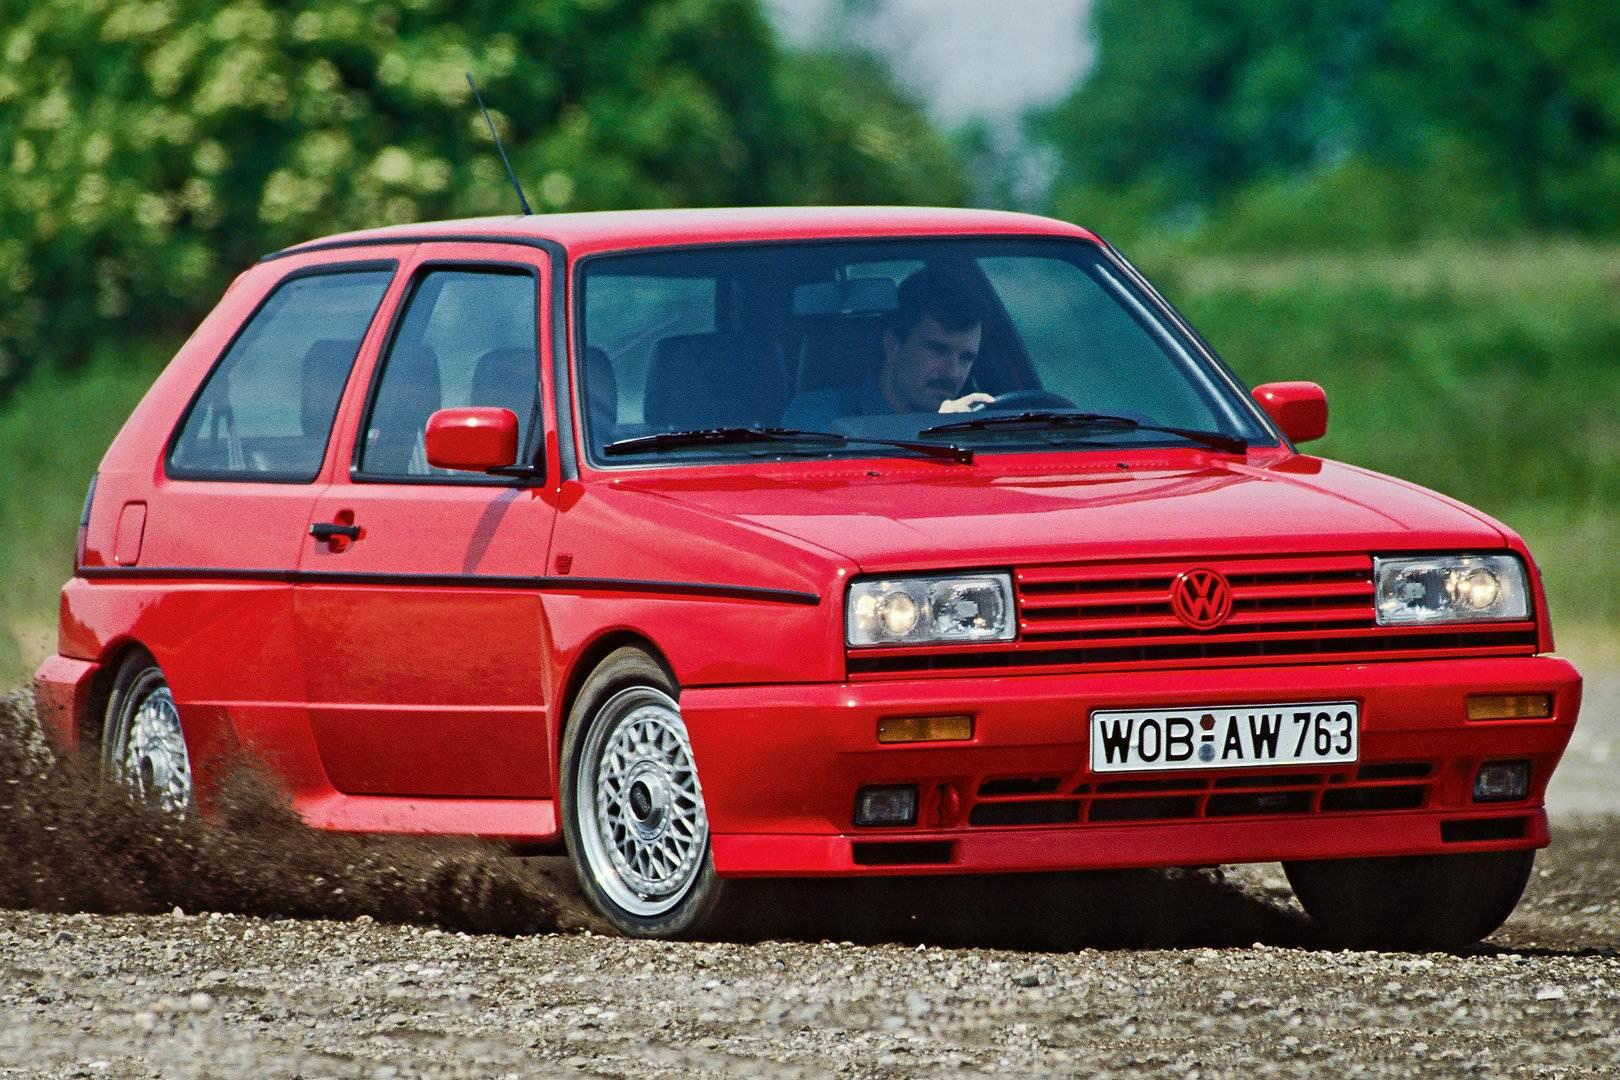 Coche del dia: Volkswagen Golf G60 Rallye (1G)